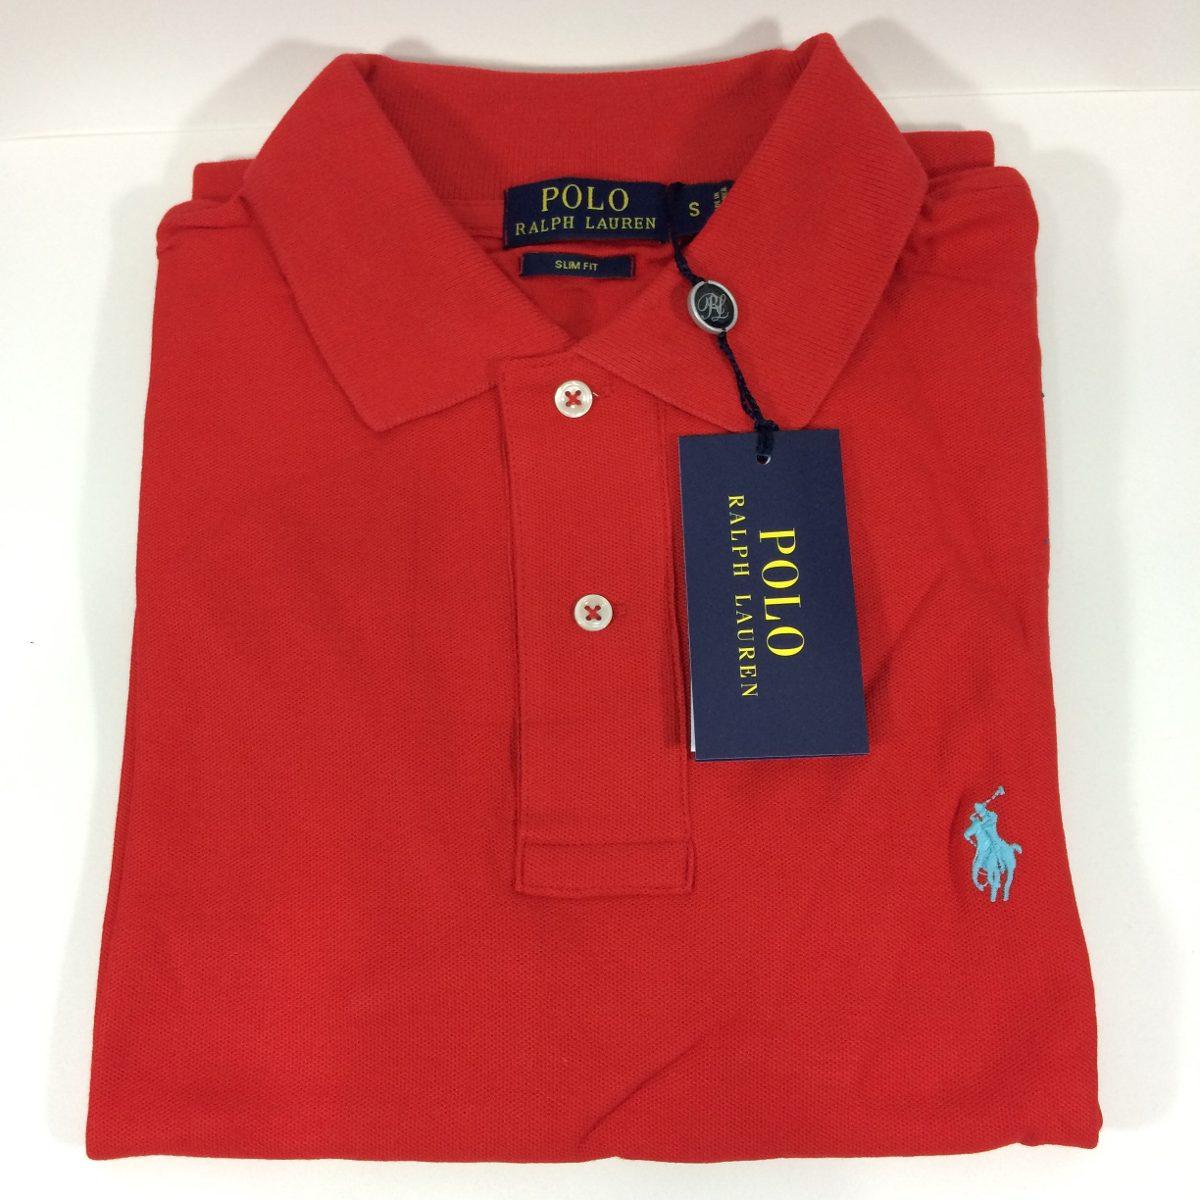 47c31cbbd4 Camisa polo masculina ralph lauren original slim fit algodão jpg 1200x1200 Camisetas  polo ralph lauren